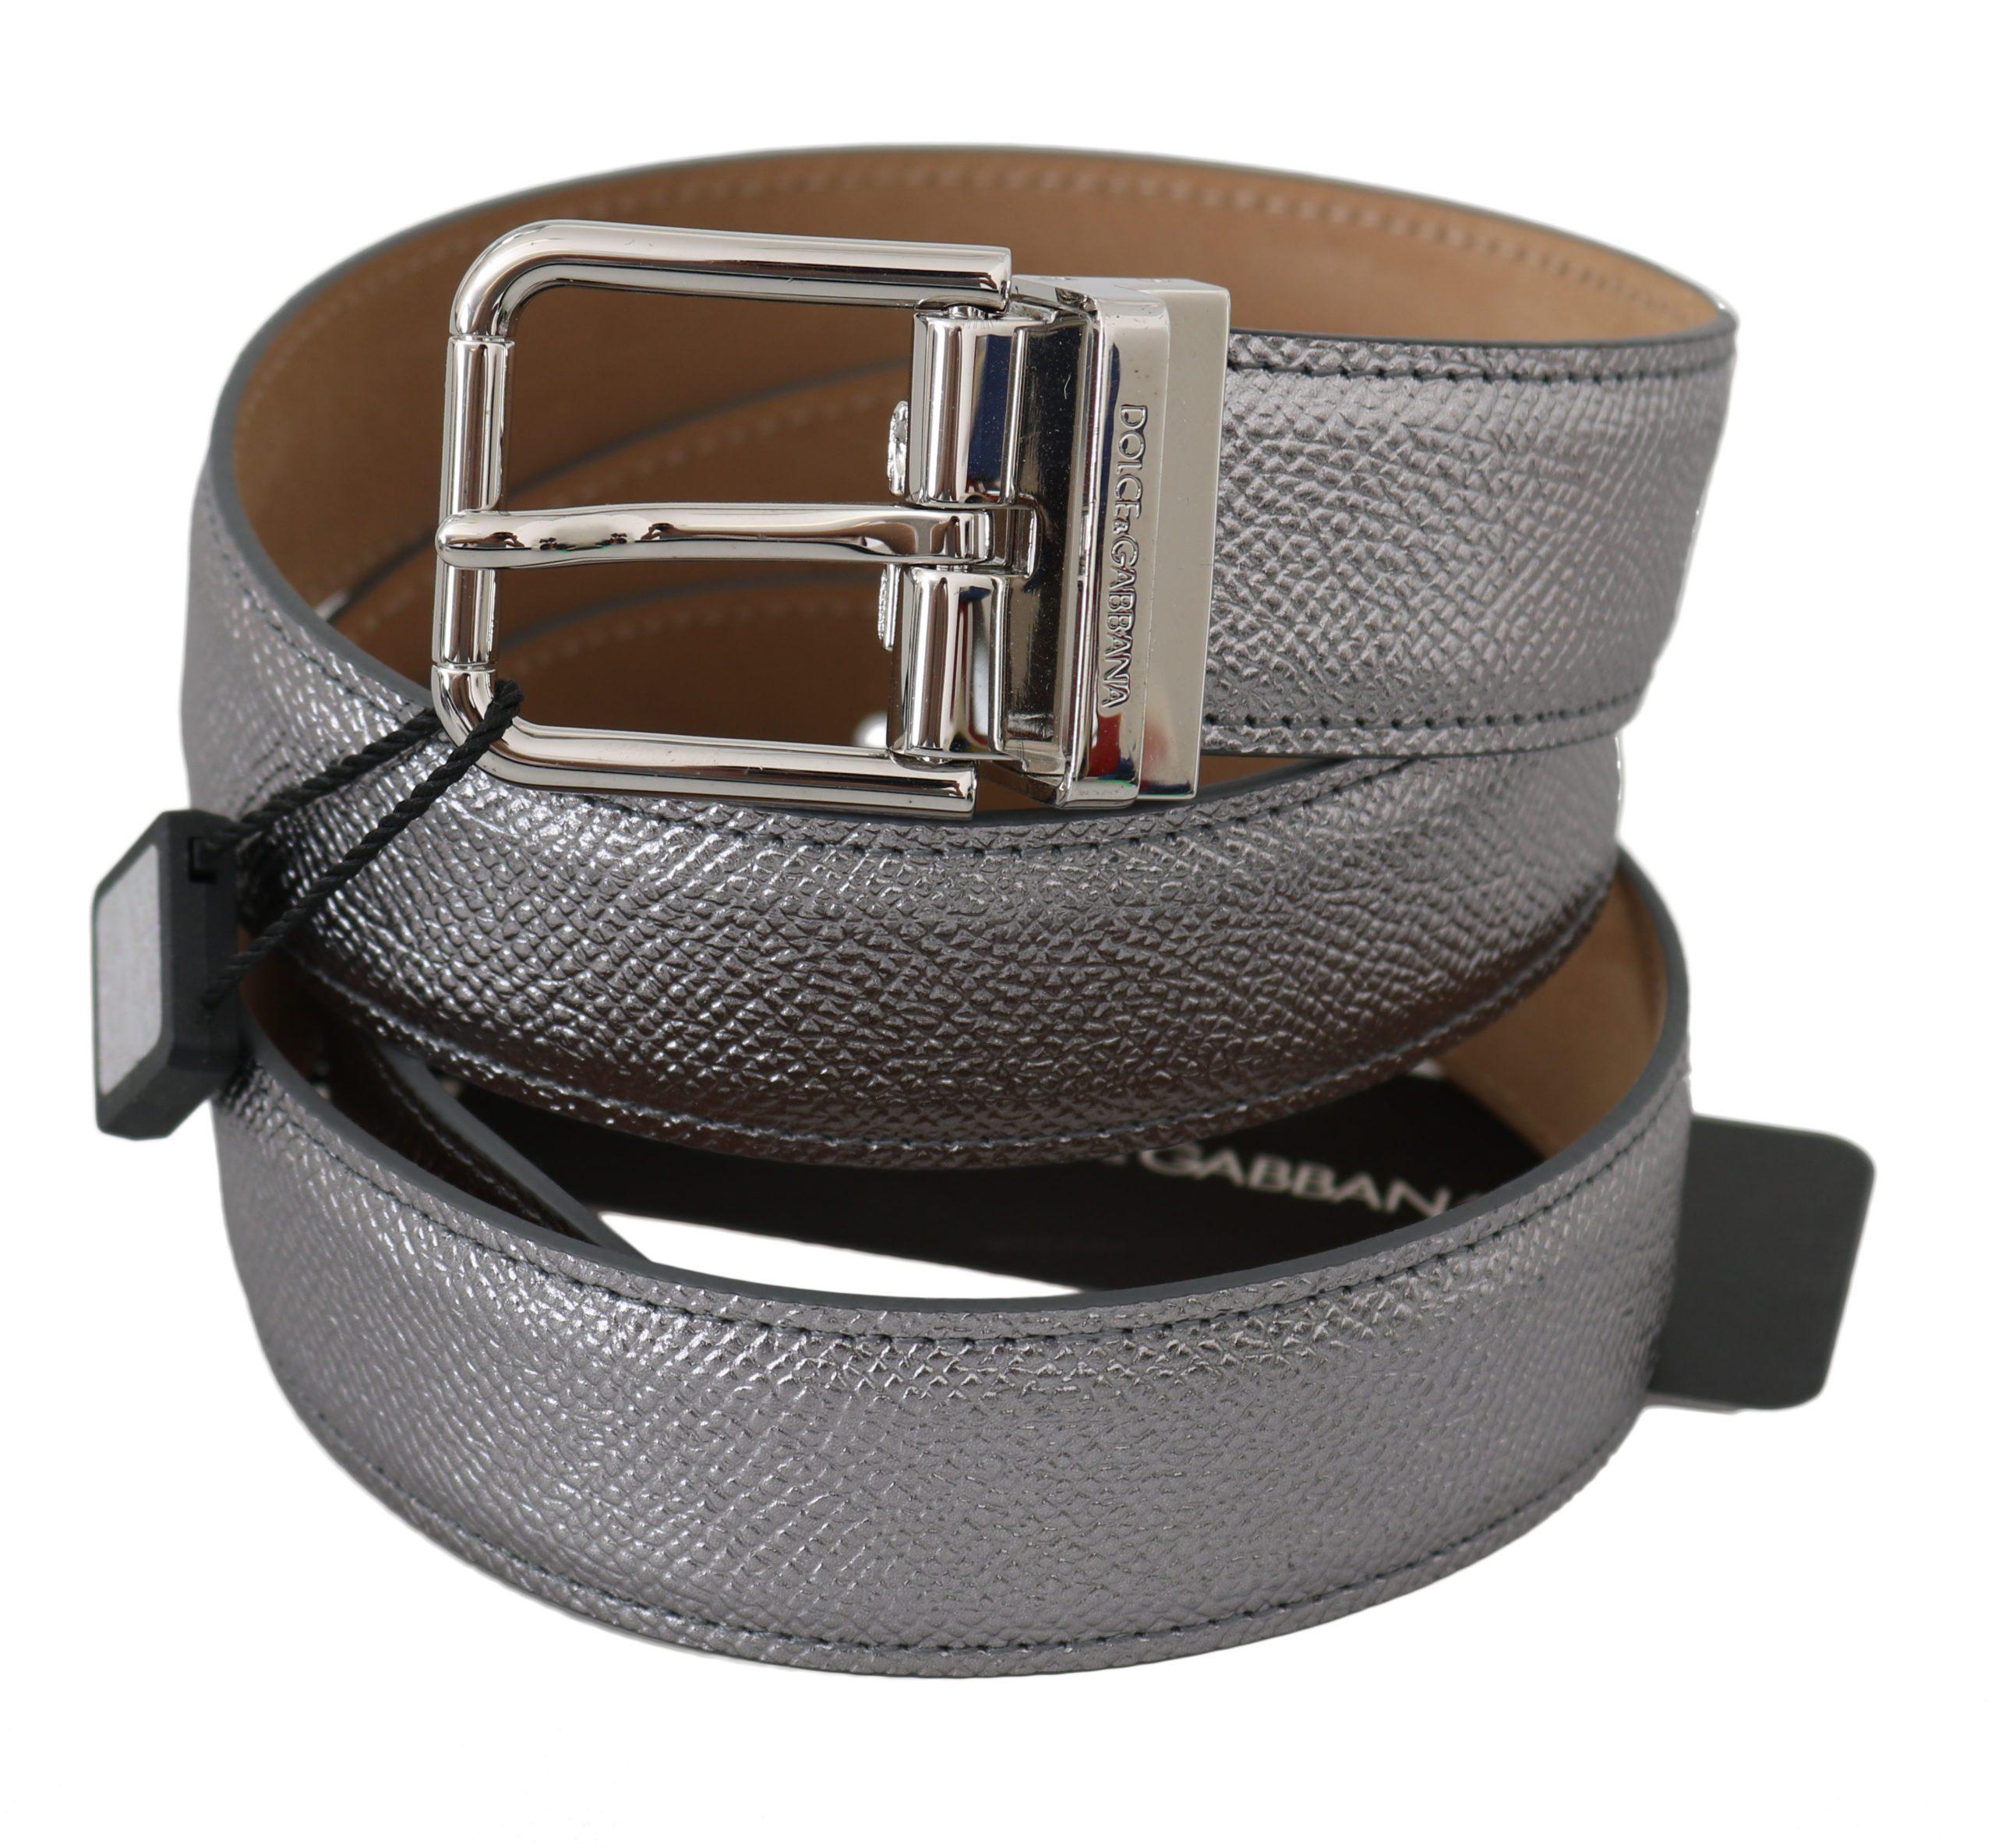 Dolce & Gabbana Men's Leather Shiny Metal Buckle Belt Silver BEL60358 - 80 cm / 32 Inches